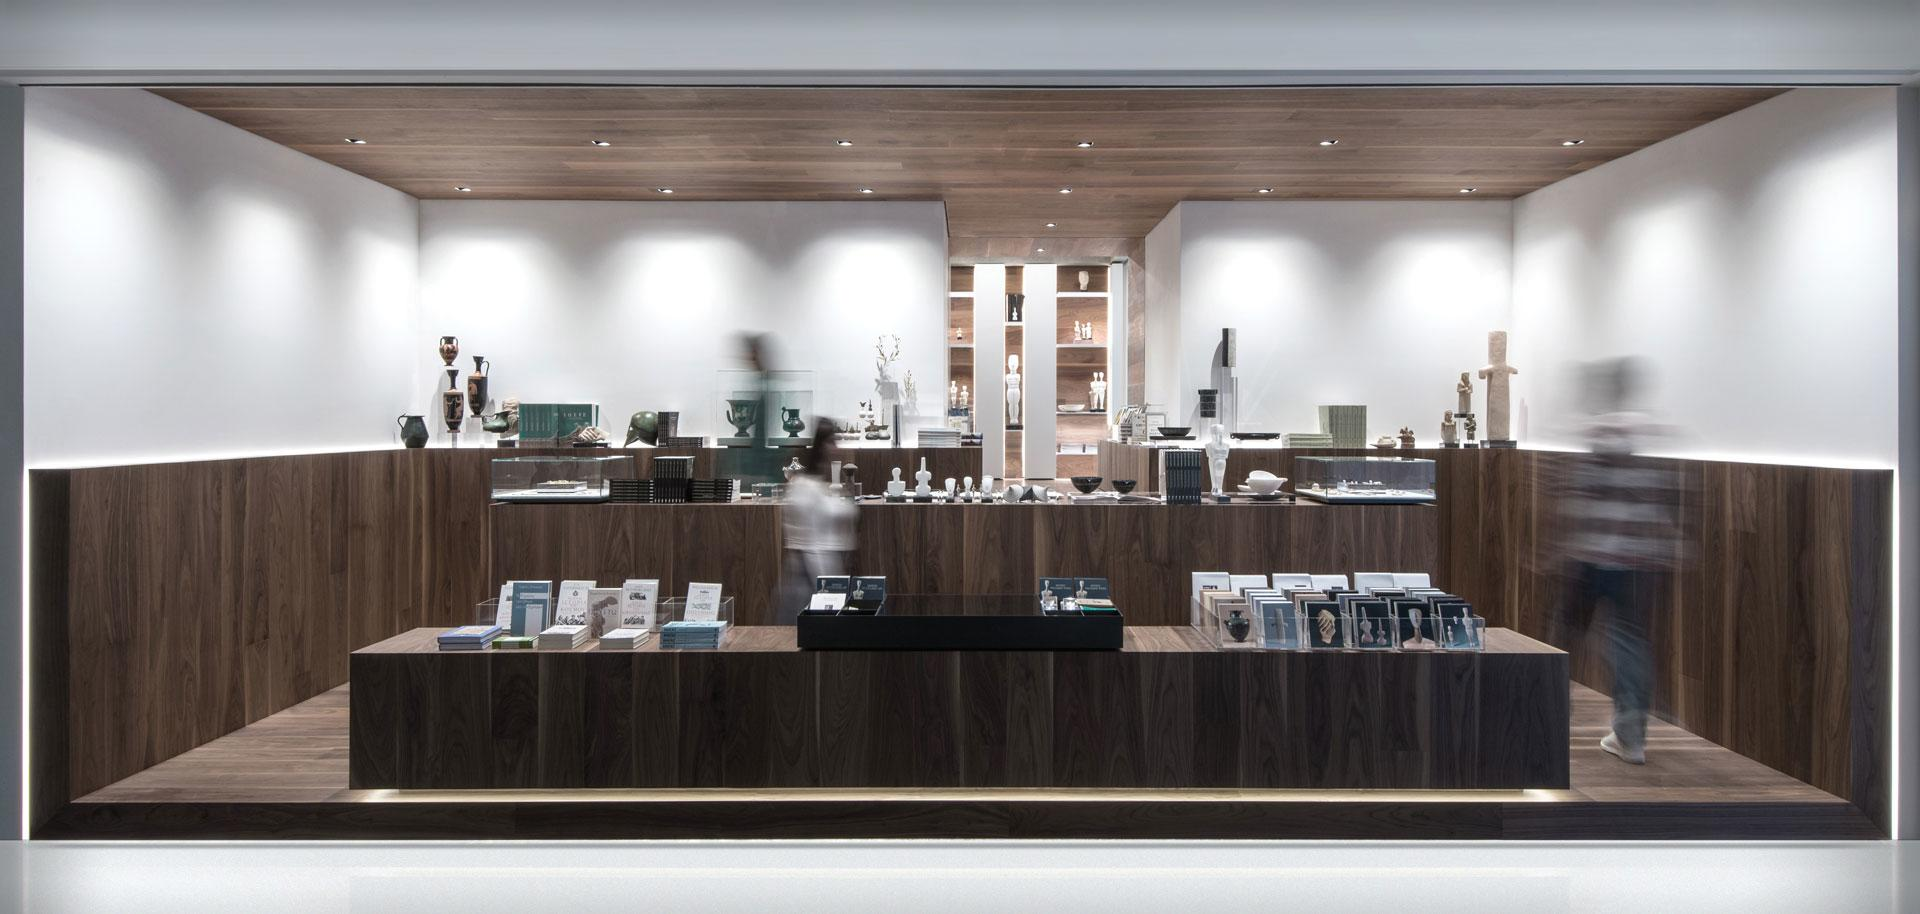 1-Cycladic-Shop_Kois-Associated-Architects